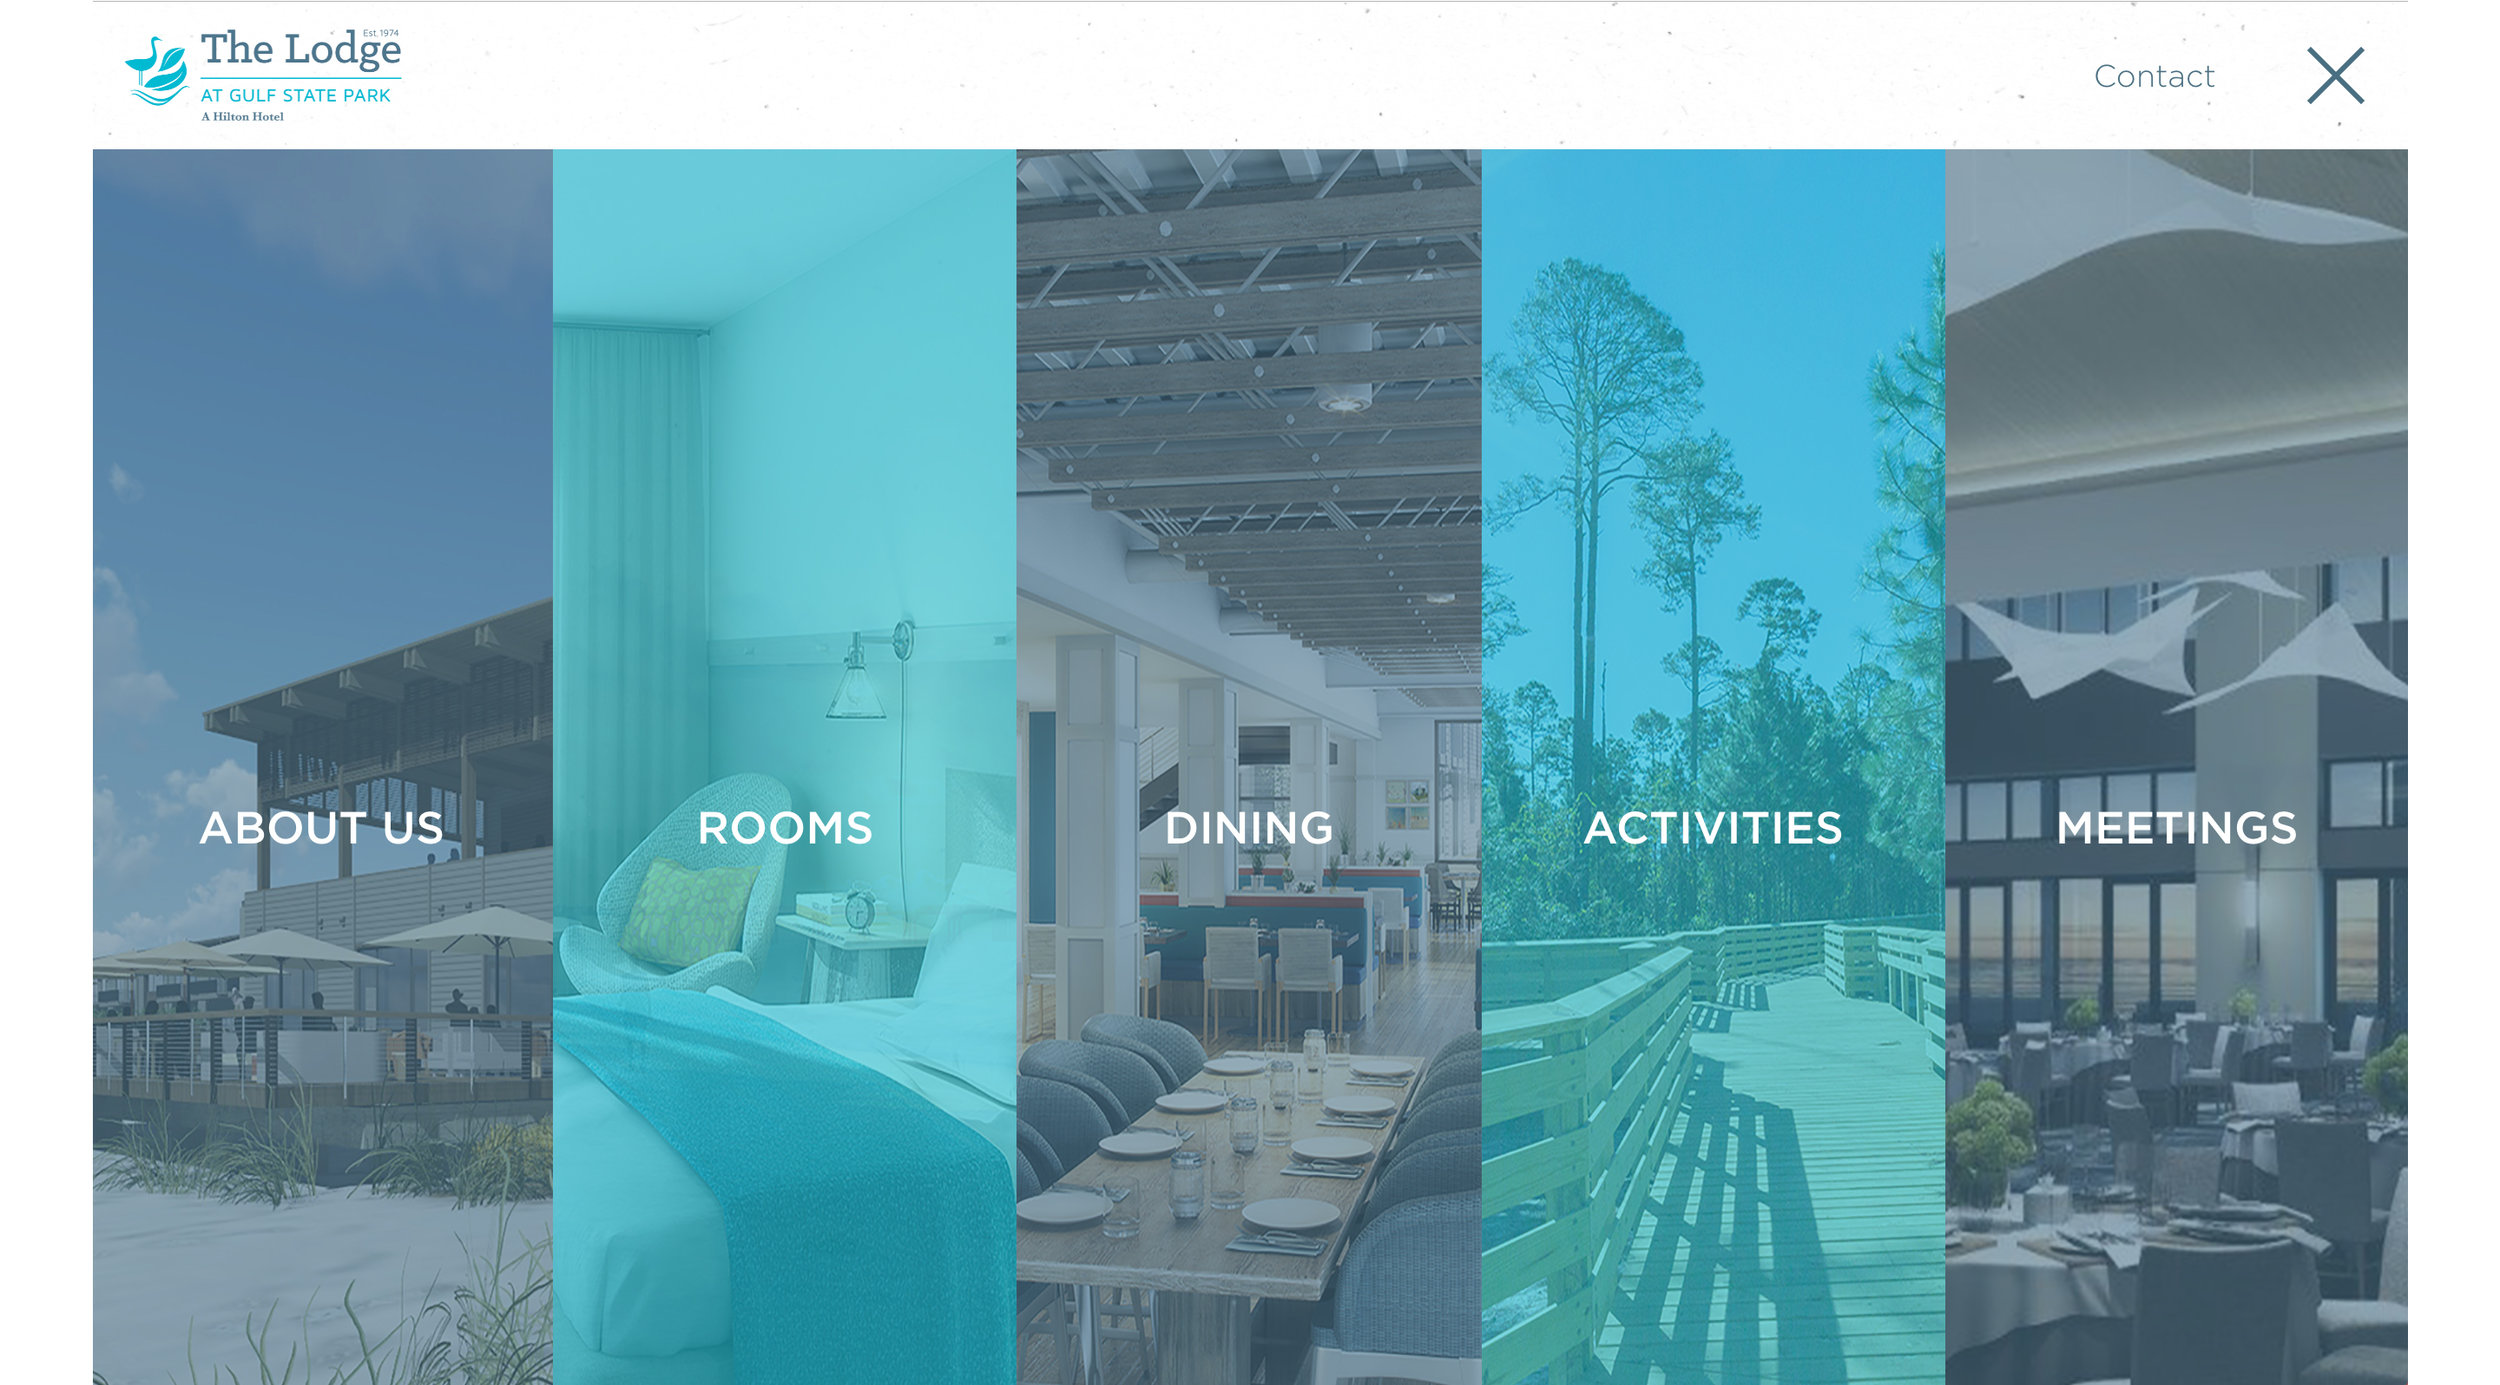 Lodge menu.jpg